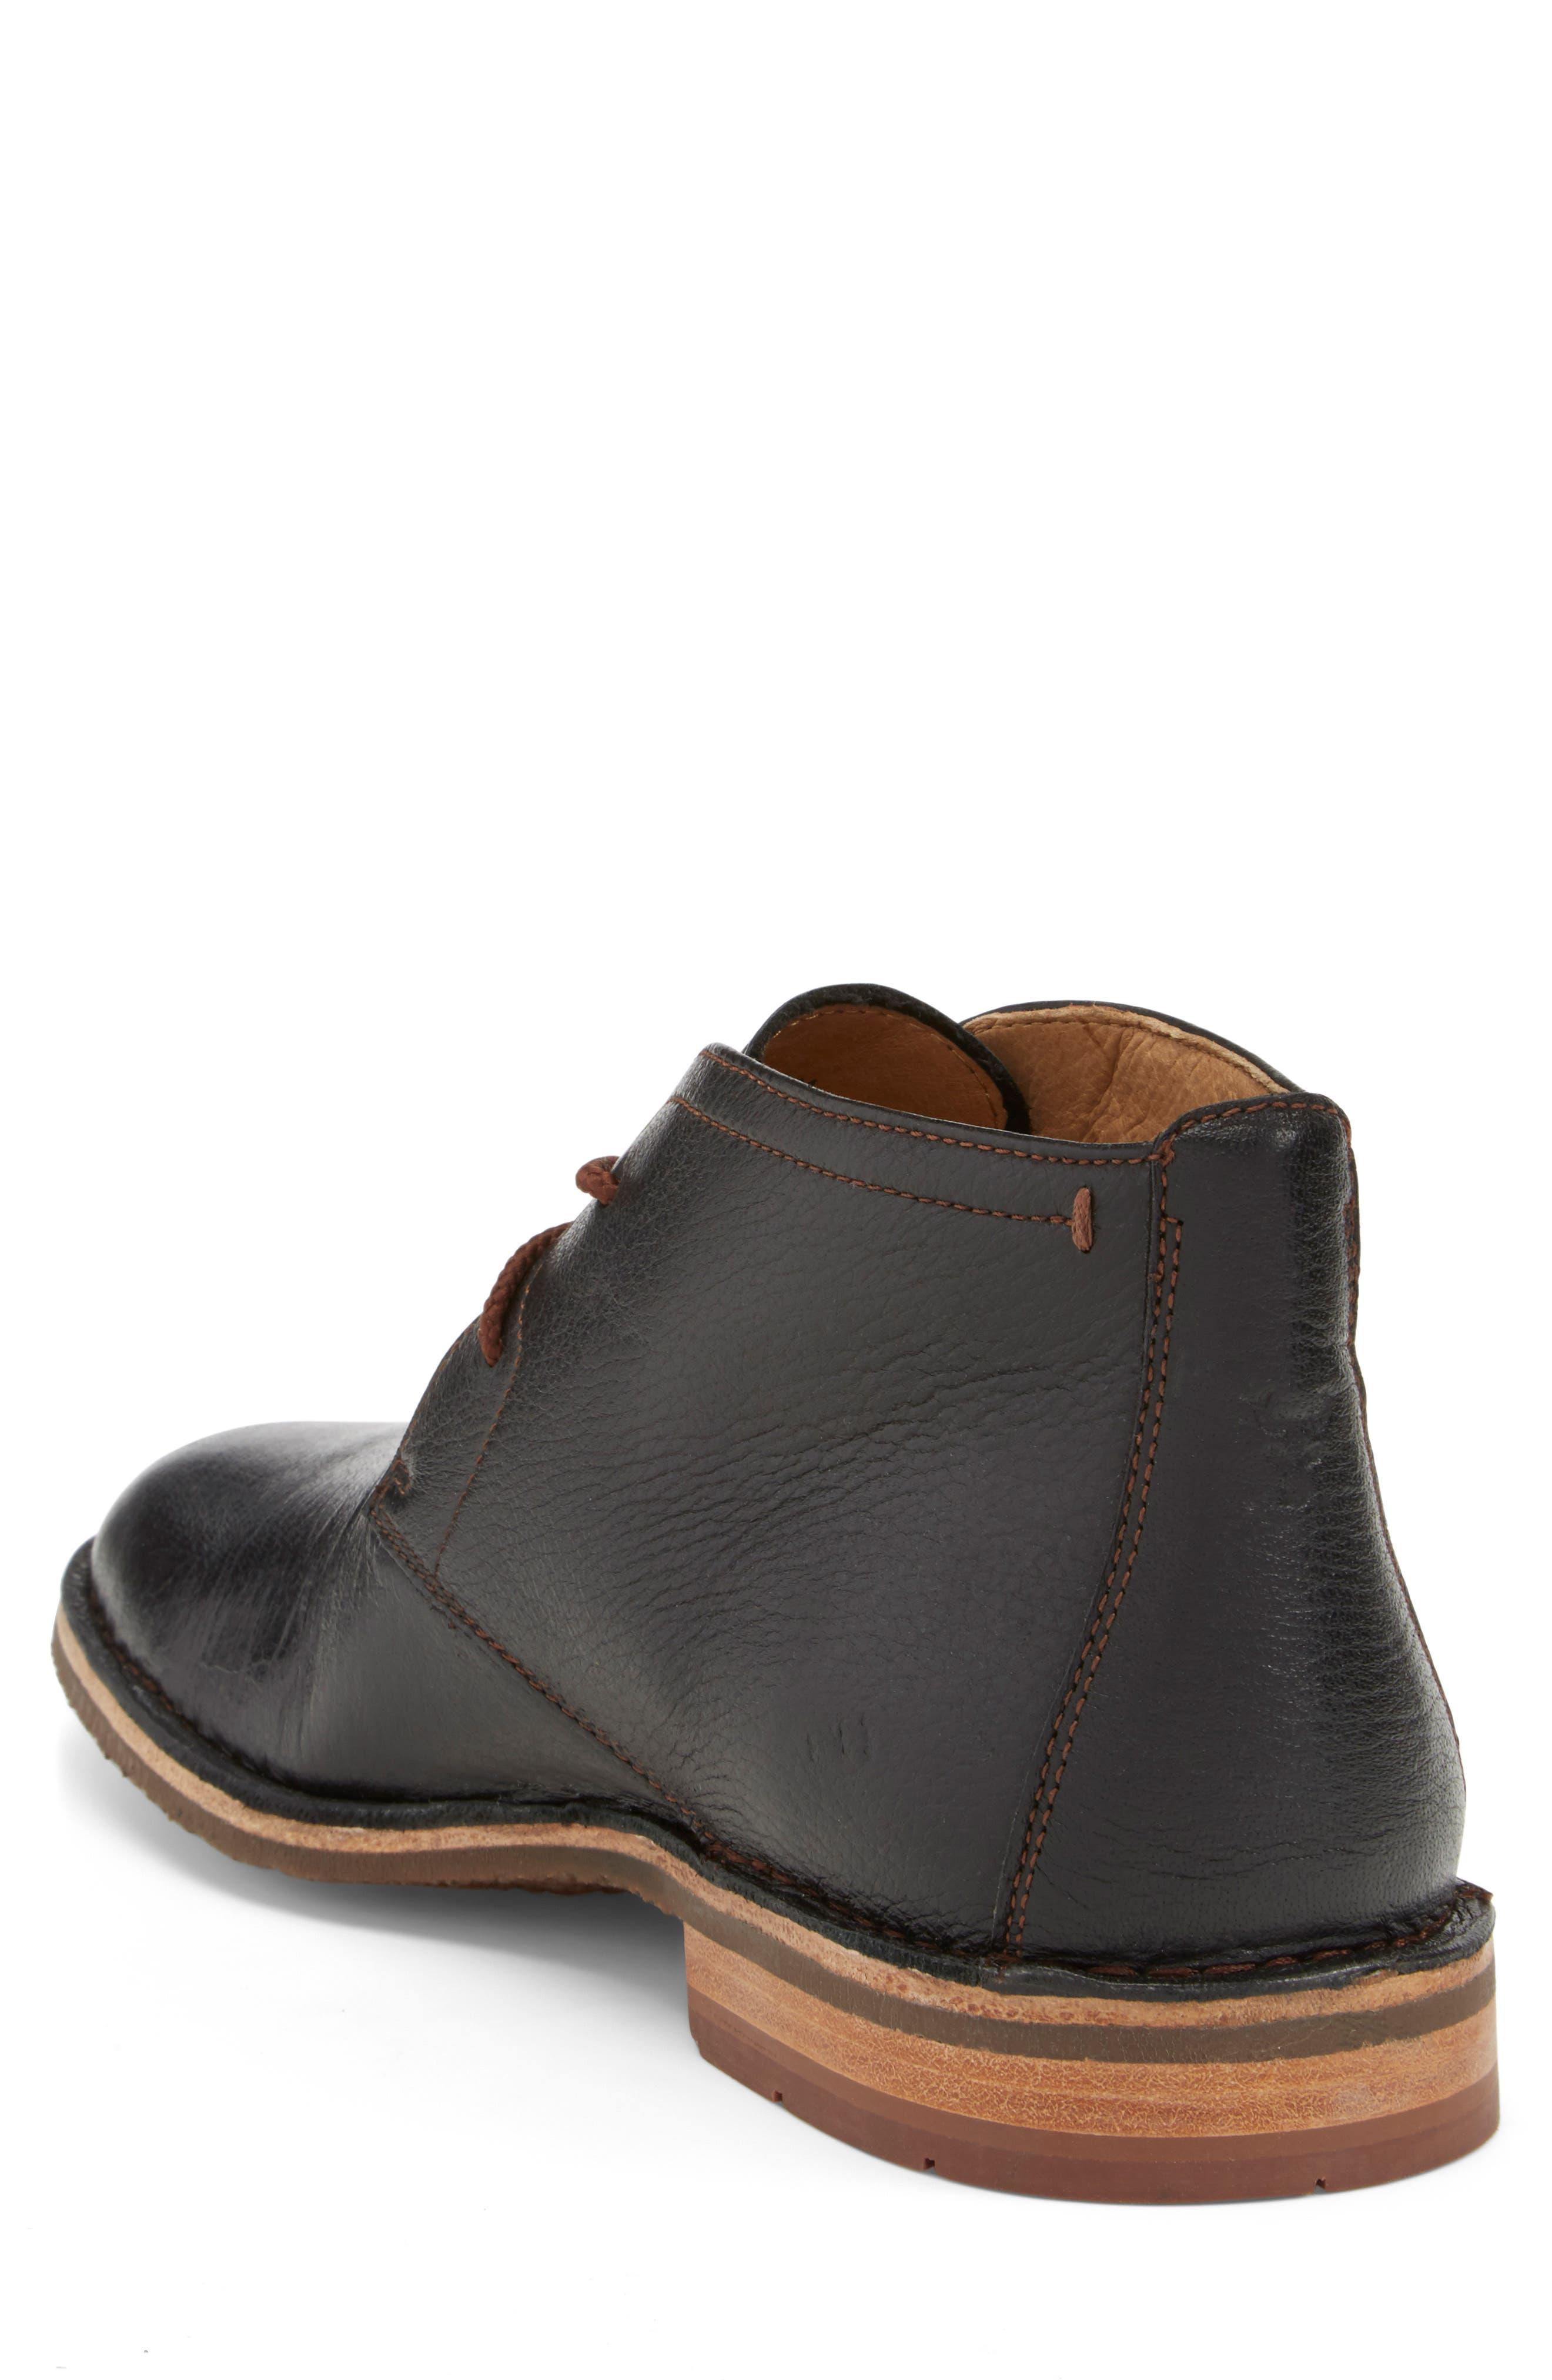 'Brady' Chukka Boot,                             Alternate thumbnail 4, color,                             BLACK NORWEGIAN ELK